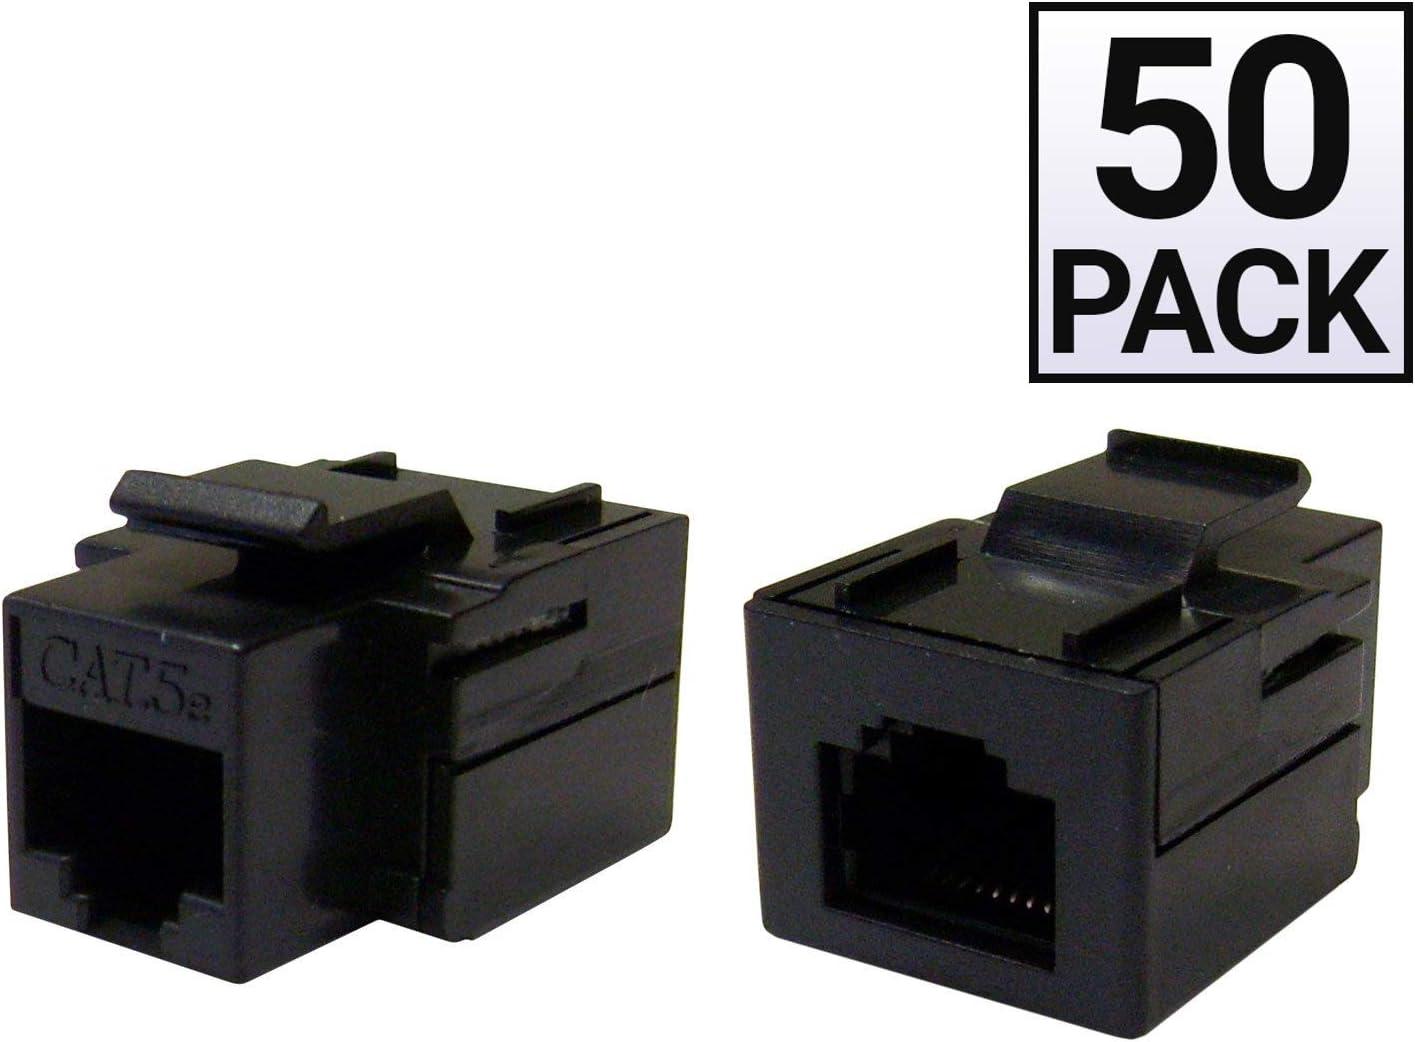 Black GOWOS 50 Pack Cat5e Keystone Inline Coupler RJ45 Female